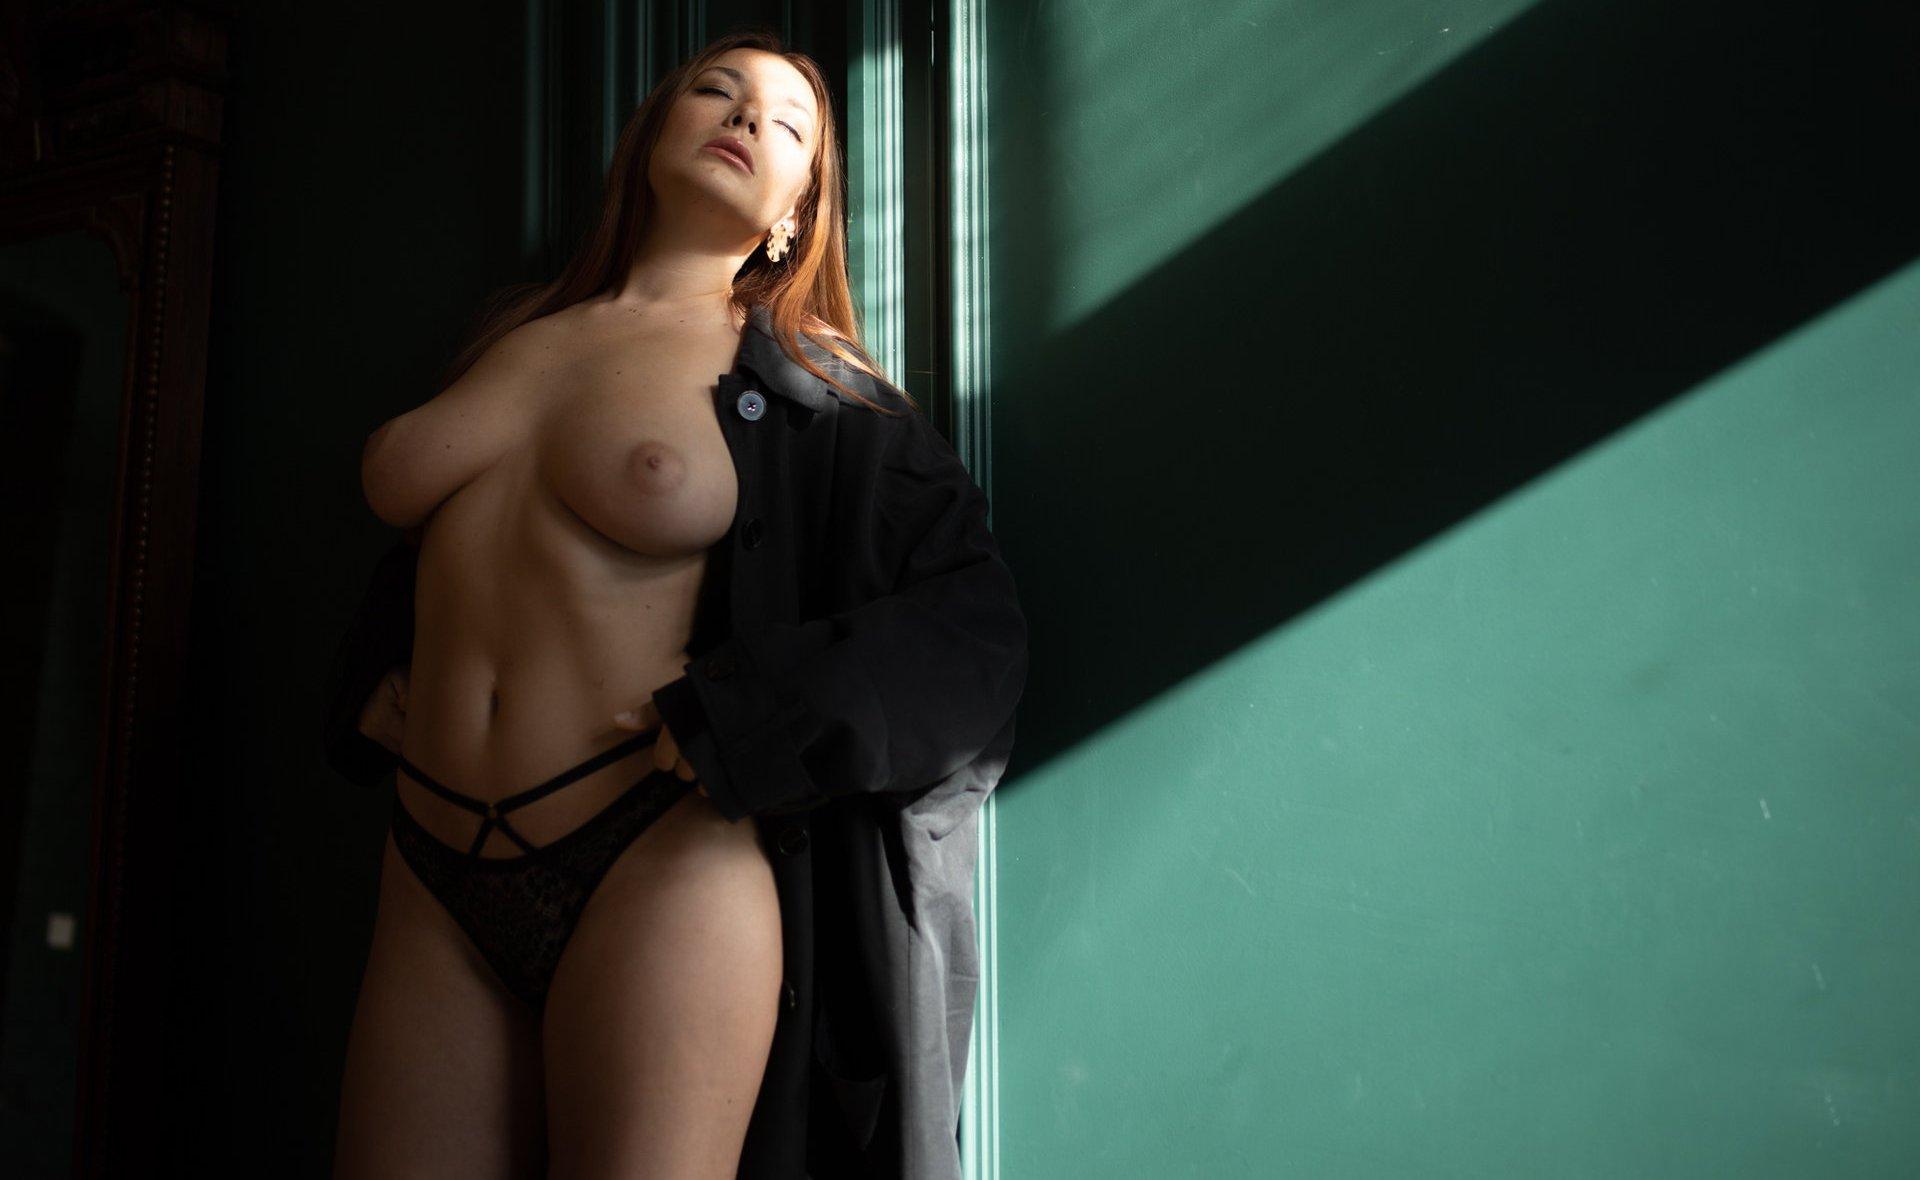 Olga Kobzar Bugs Bunny Gf Nudes Leaks 0019